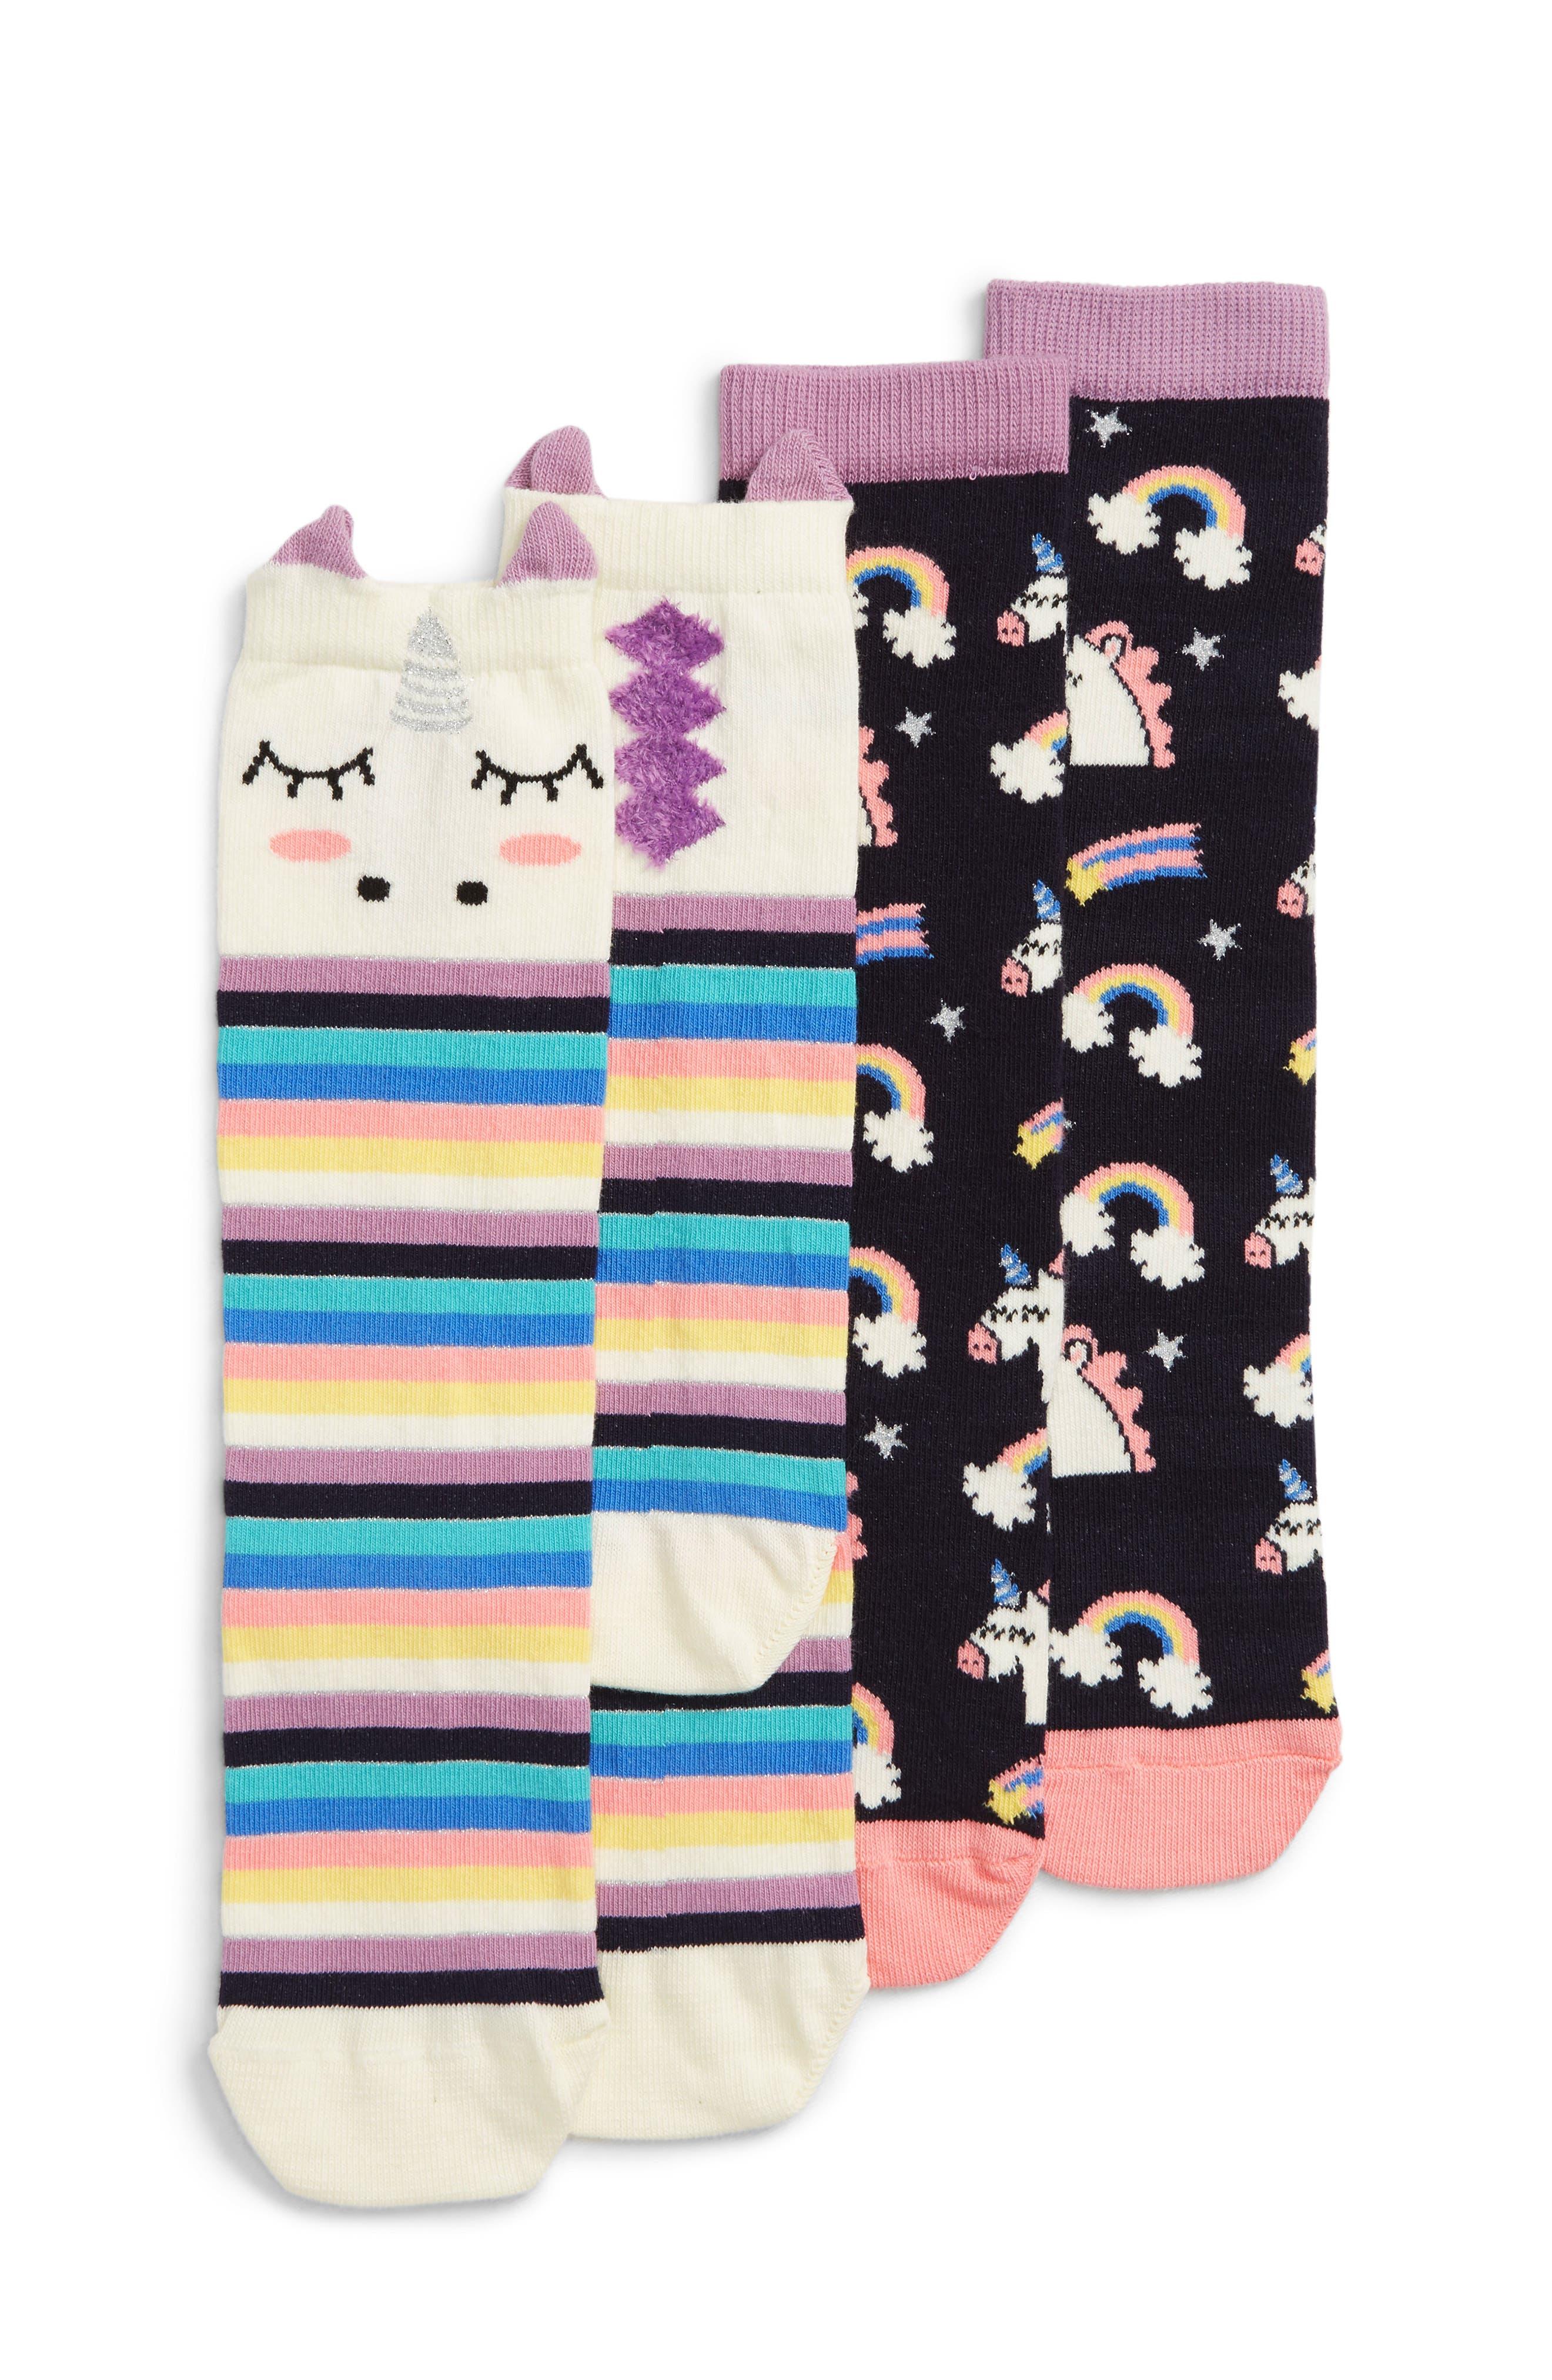 2-Pack of Rainbows & Unicorns Knee High Socks,                         Main,                         color, 101